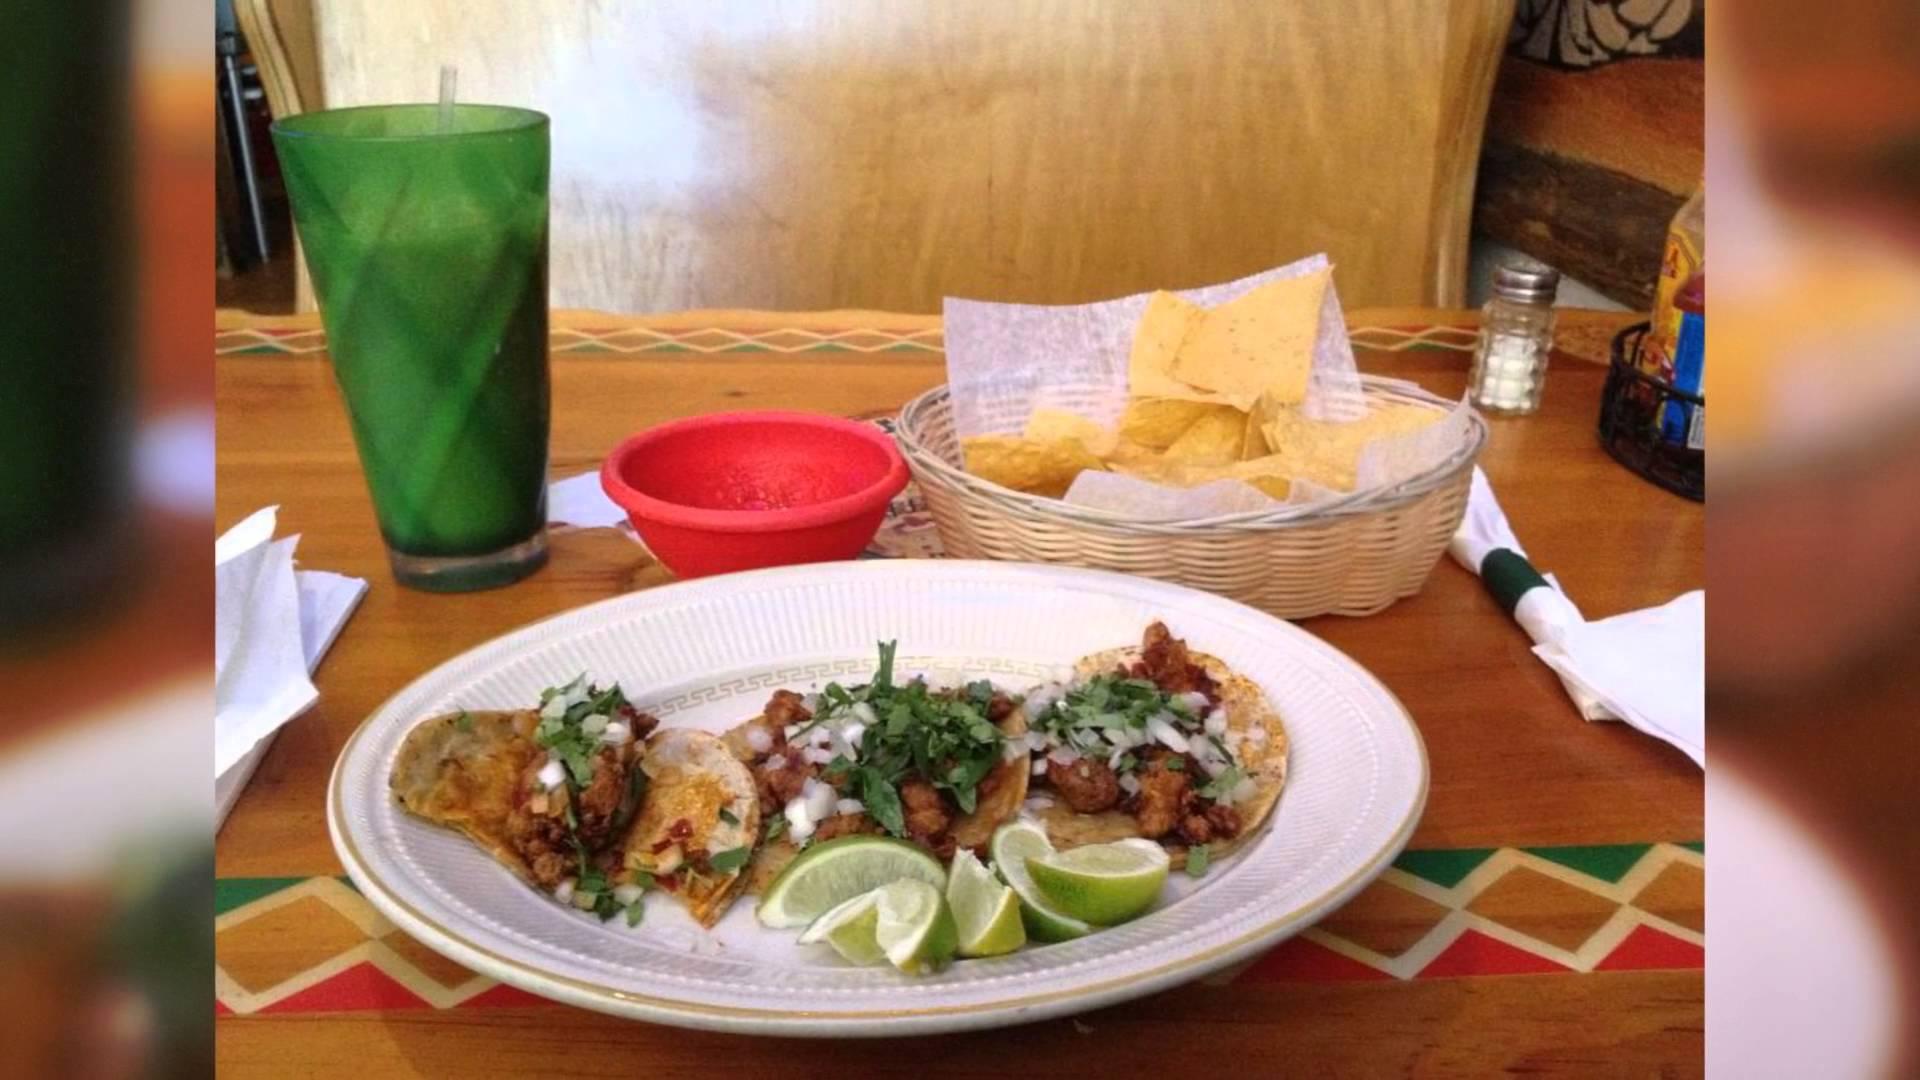 Best bars and restaurants to celebrate Cinco de Mayo in Orlando 2017